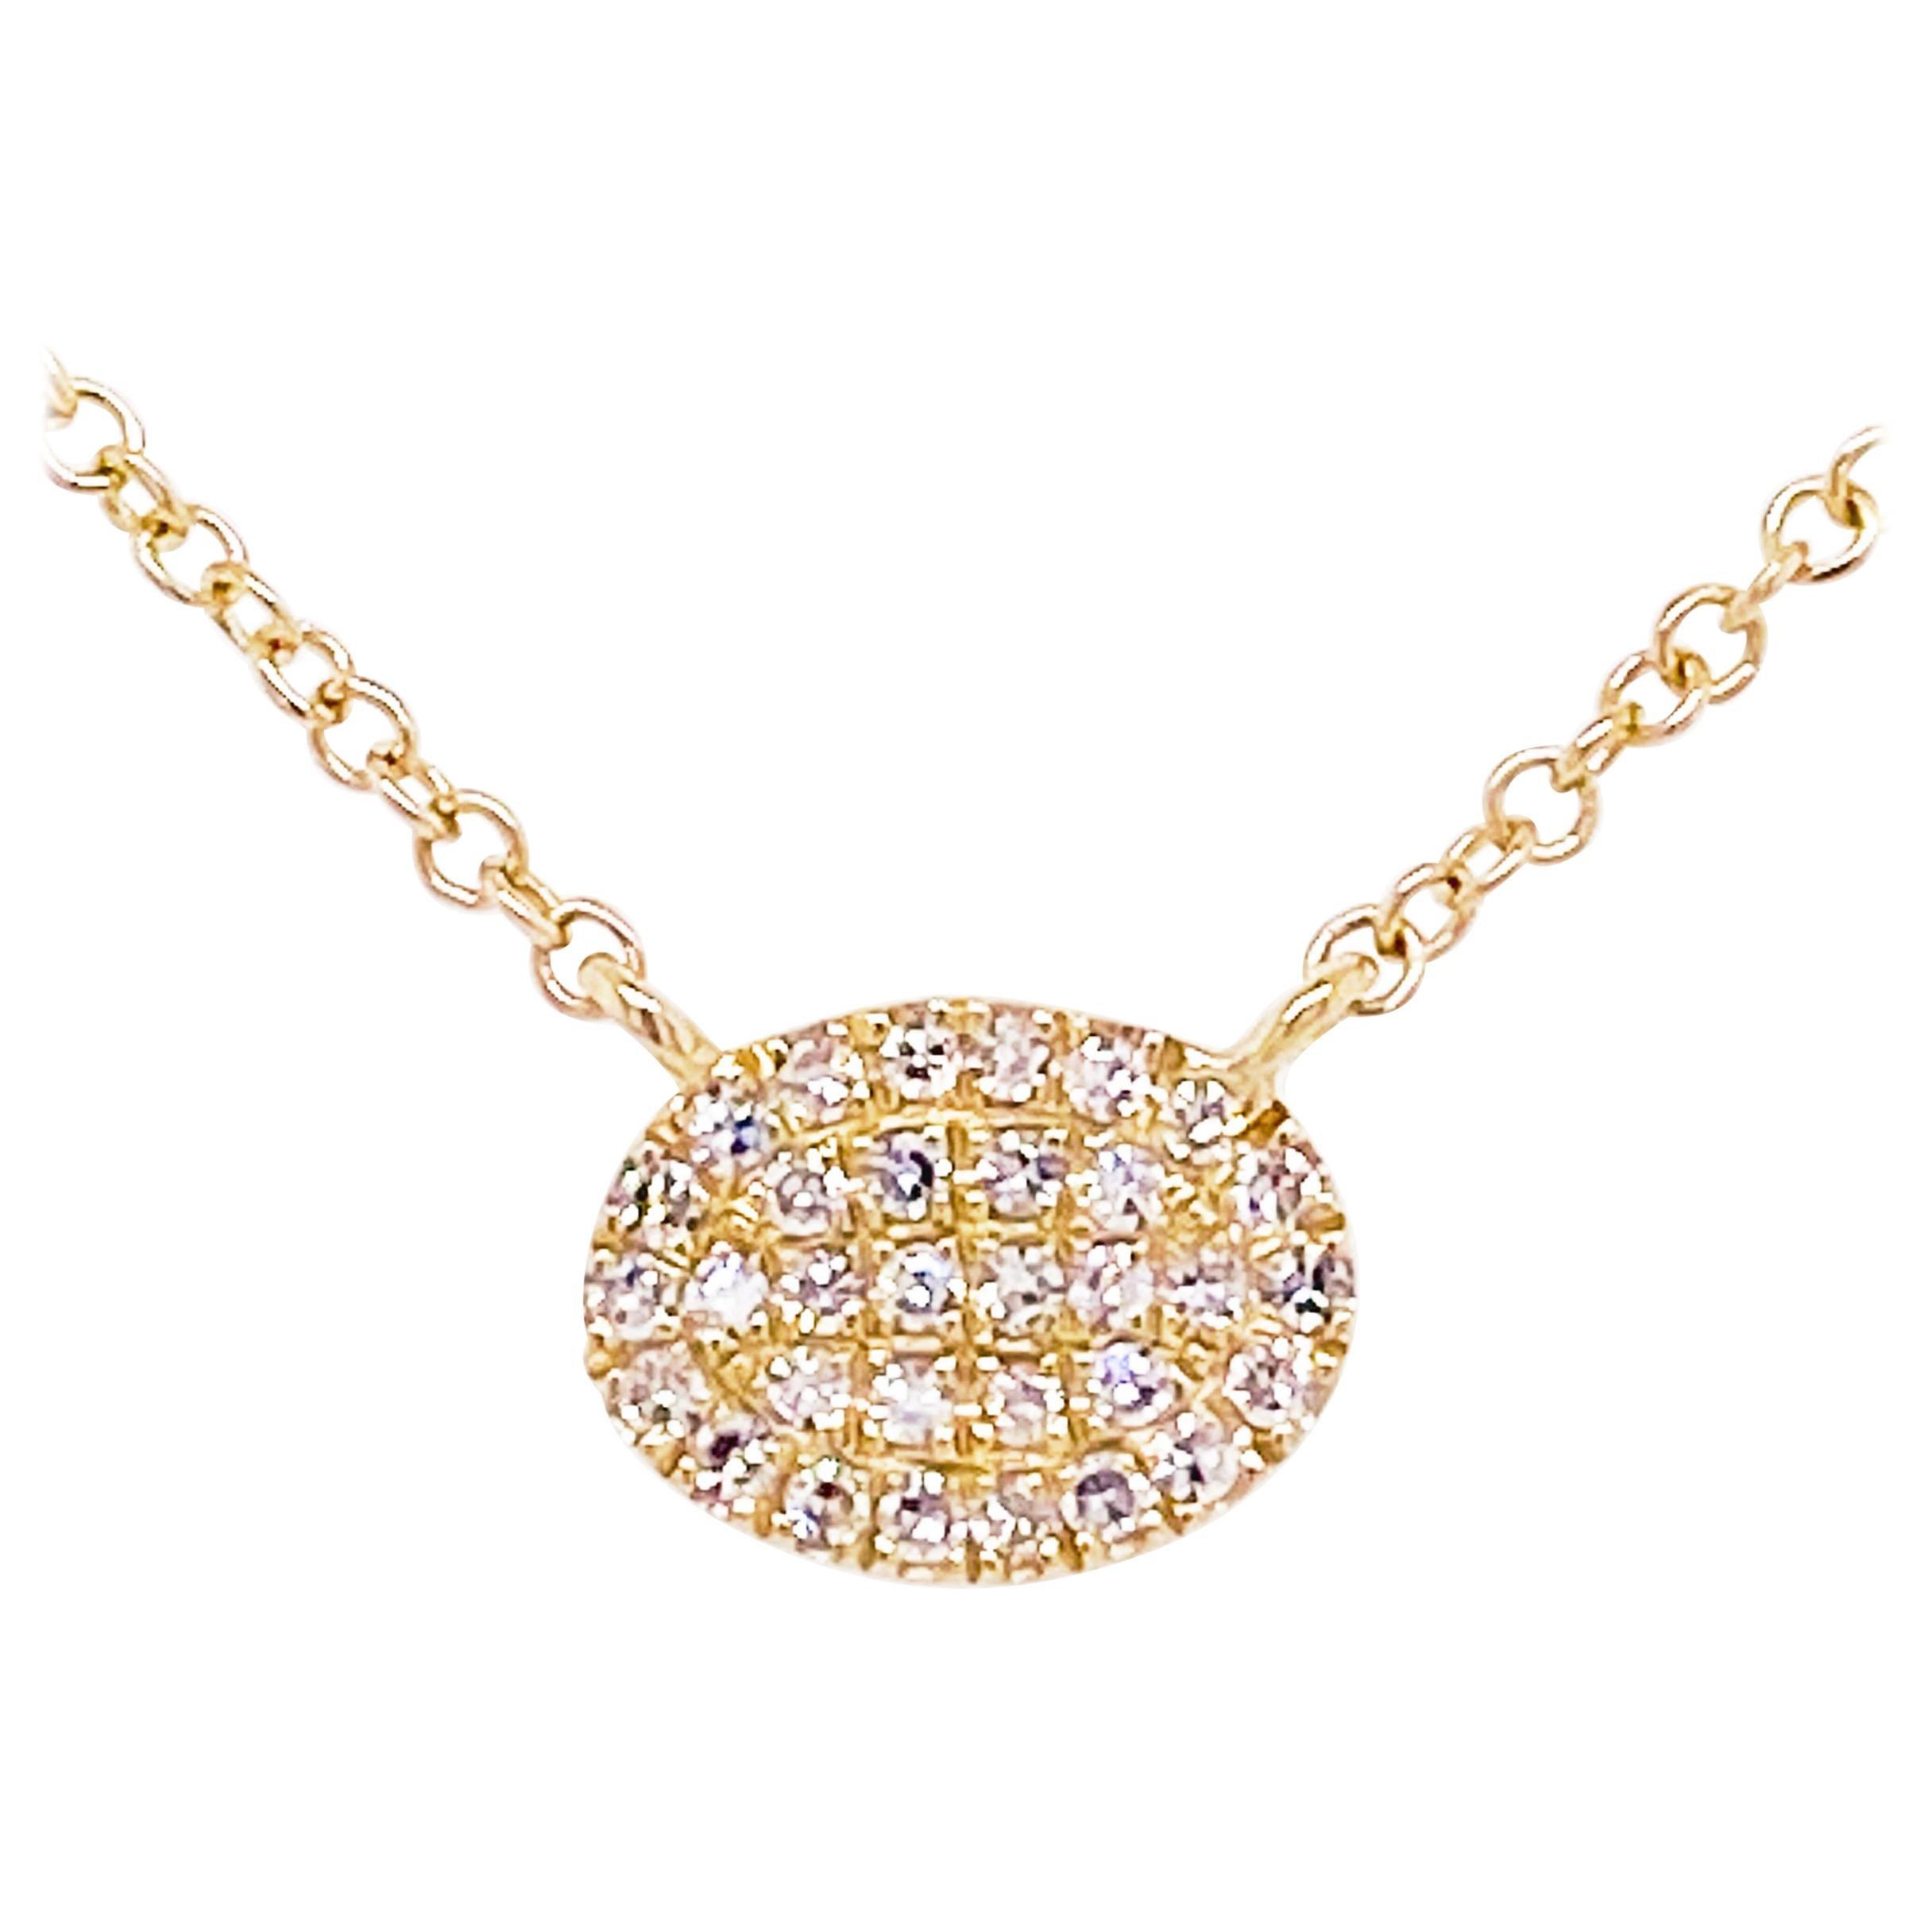 Pave Diamond Disk Necklace, 14 Karat Yellow Gold, Oval Diamond Disk Pendant Bolo